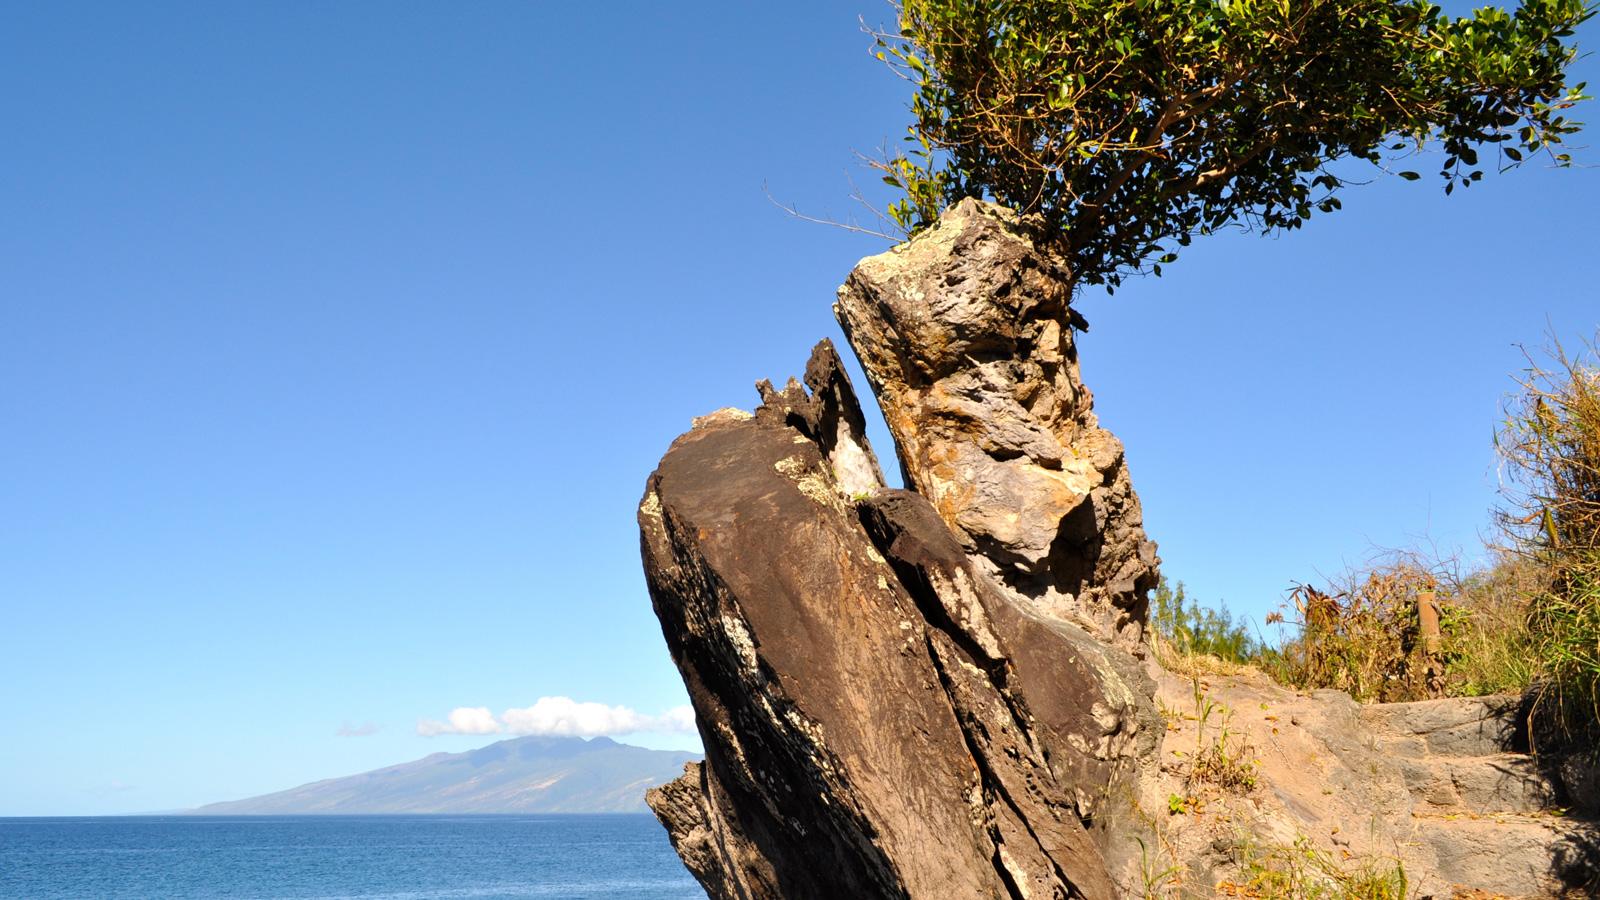 The Kapalua Coastal Trail